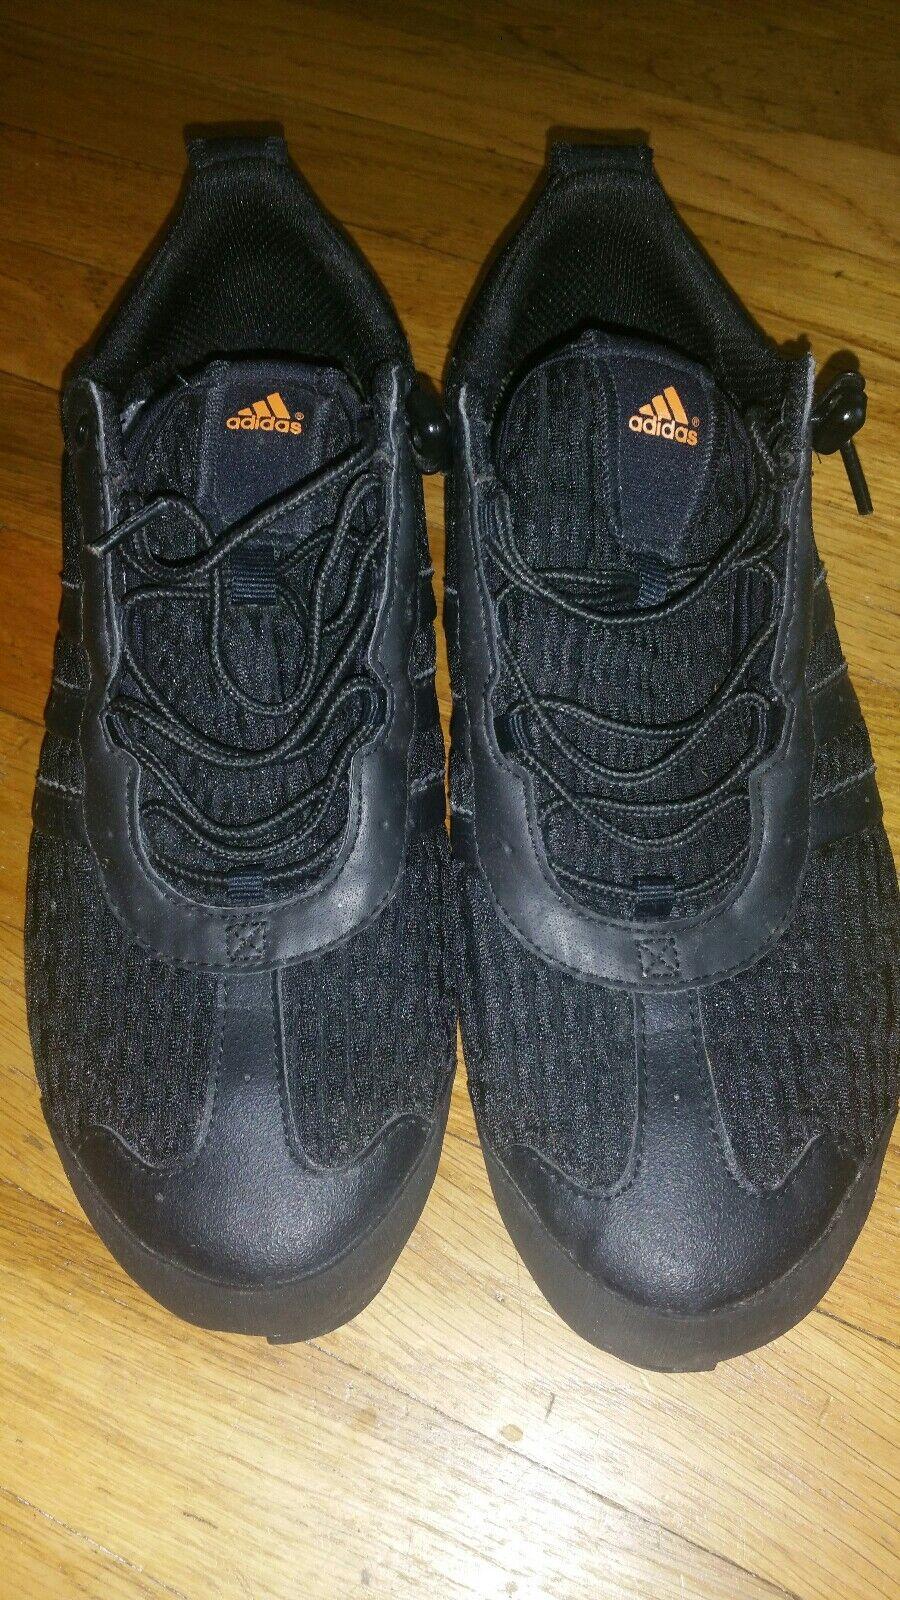 Men's Adidas CC Daroga Air M Outdoor Climacool Plein Air Daroga  Black/Orapee/Black Sz 10.5 997577